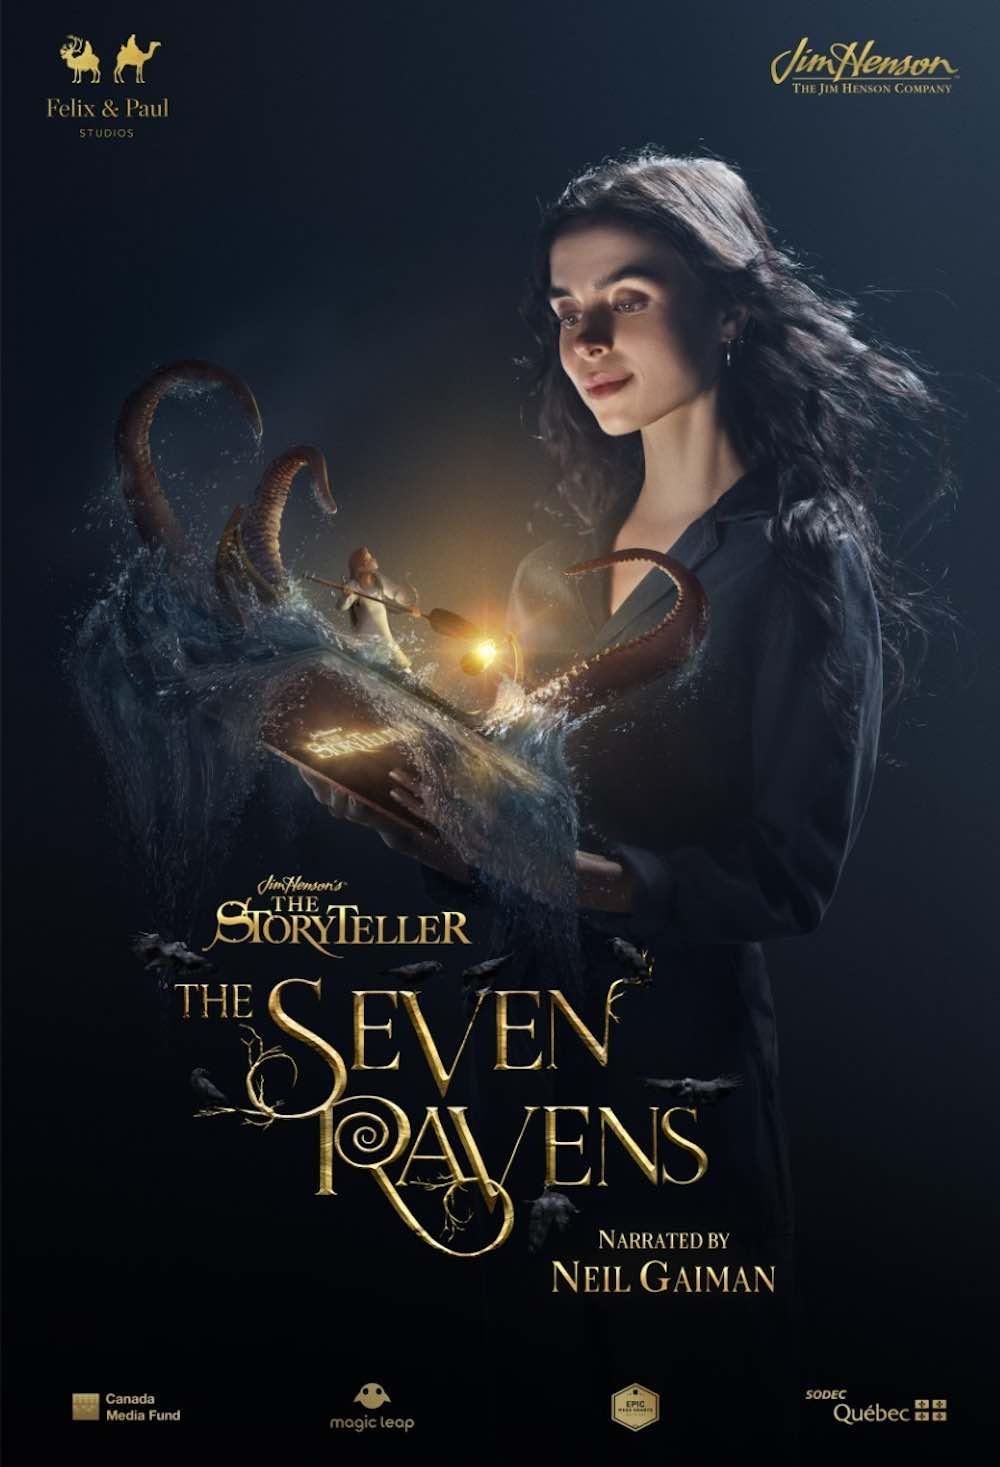 The Storyteller The Seven Ravens Plakat der AR-Erfahrung der Felix & Paul Studios